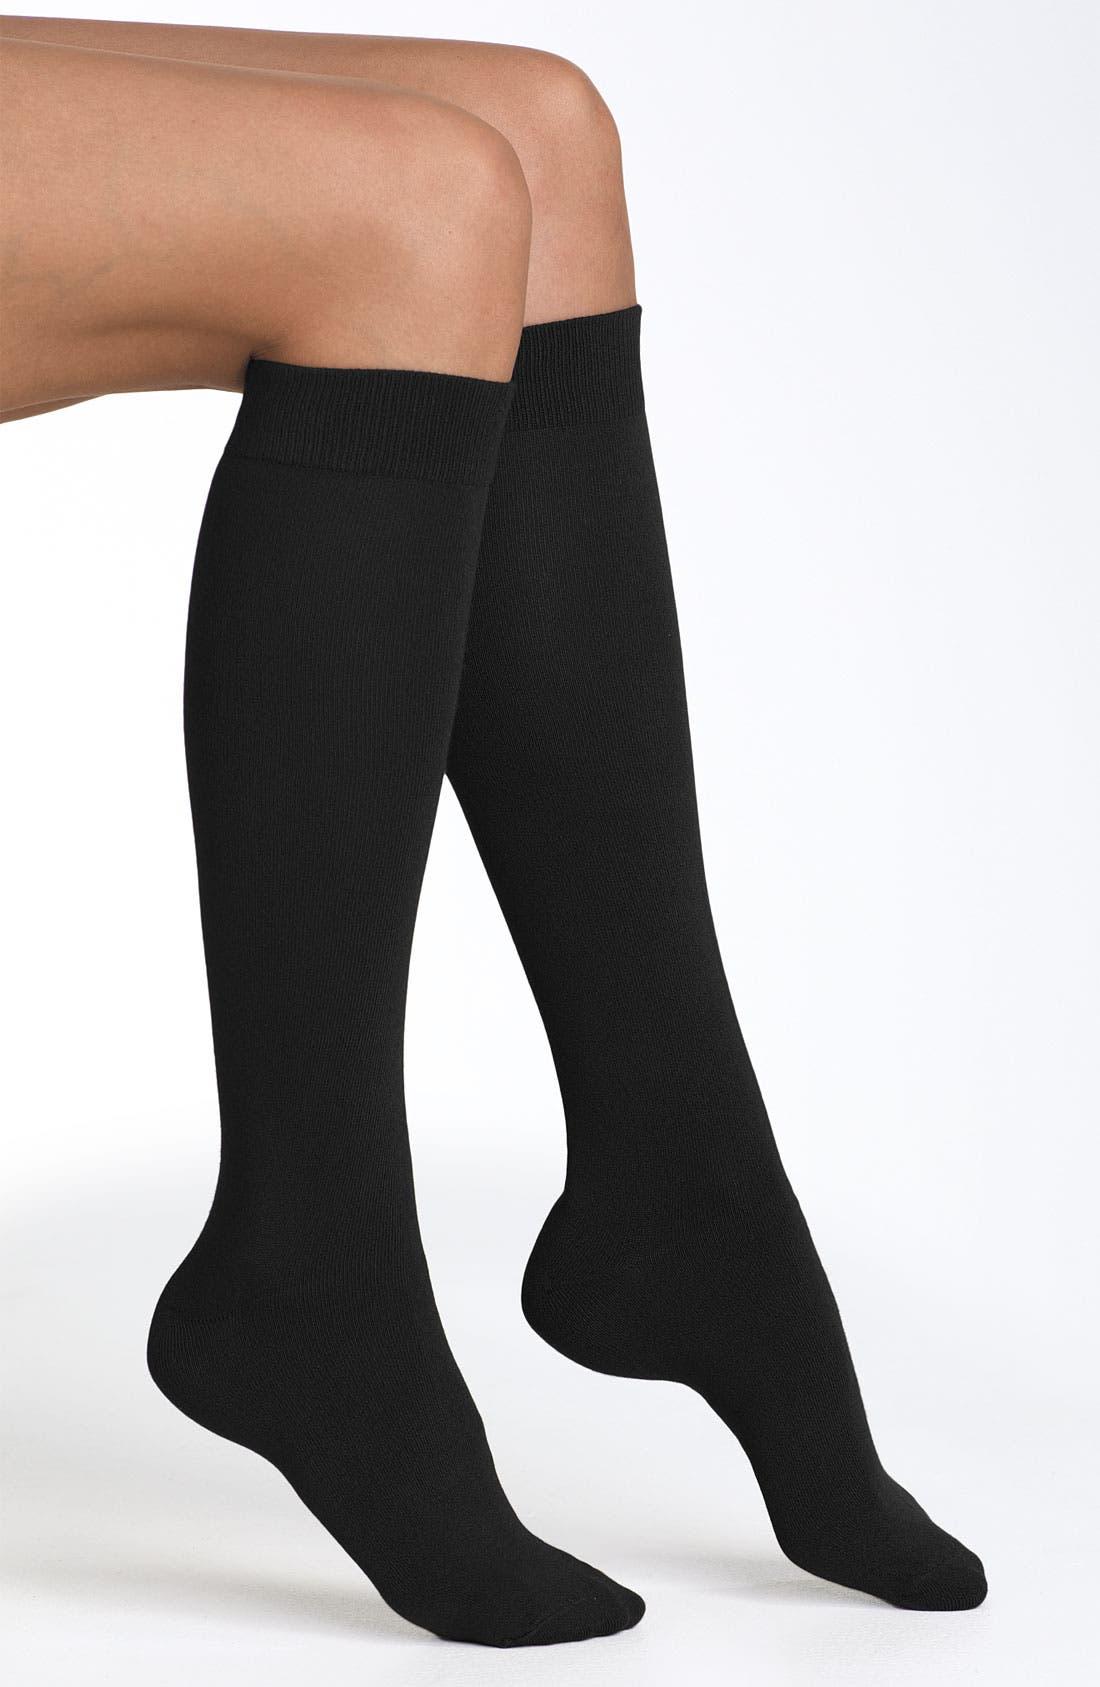 Knee High Socks,                             Main thumbnail 1, color,                             001